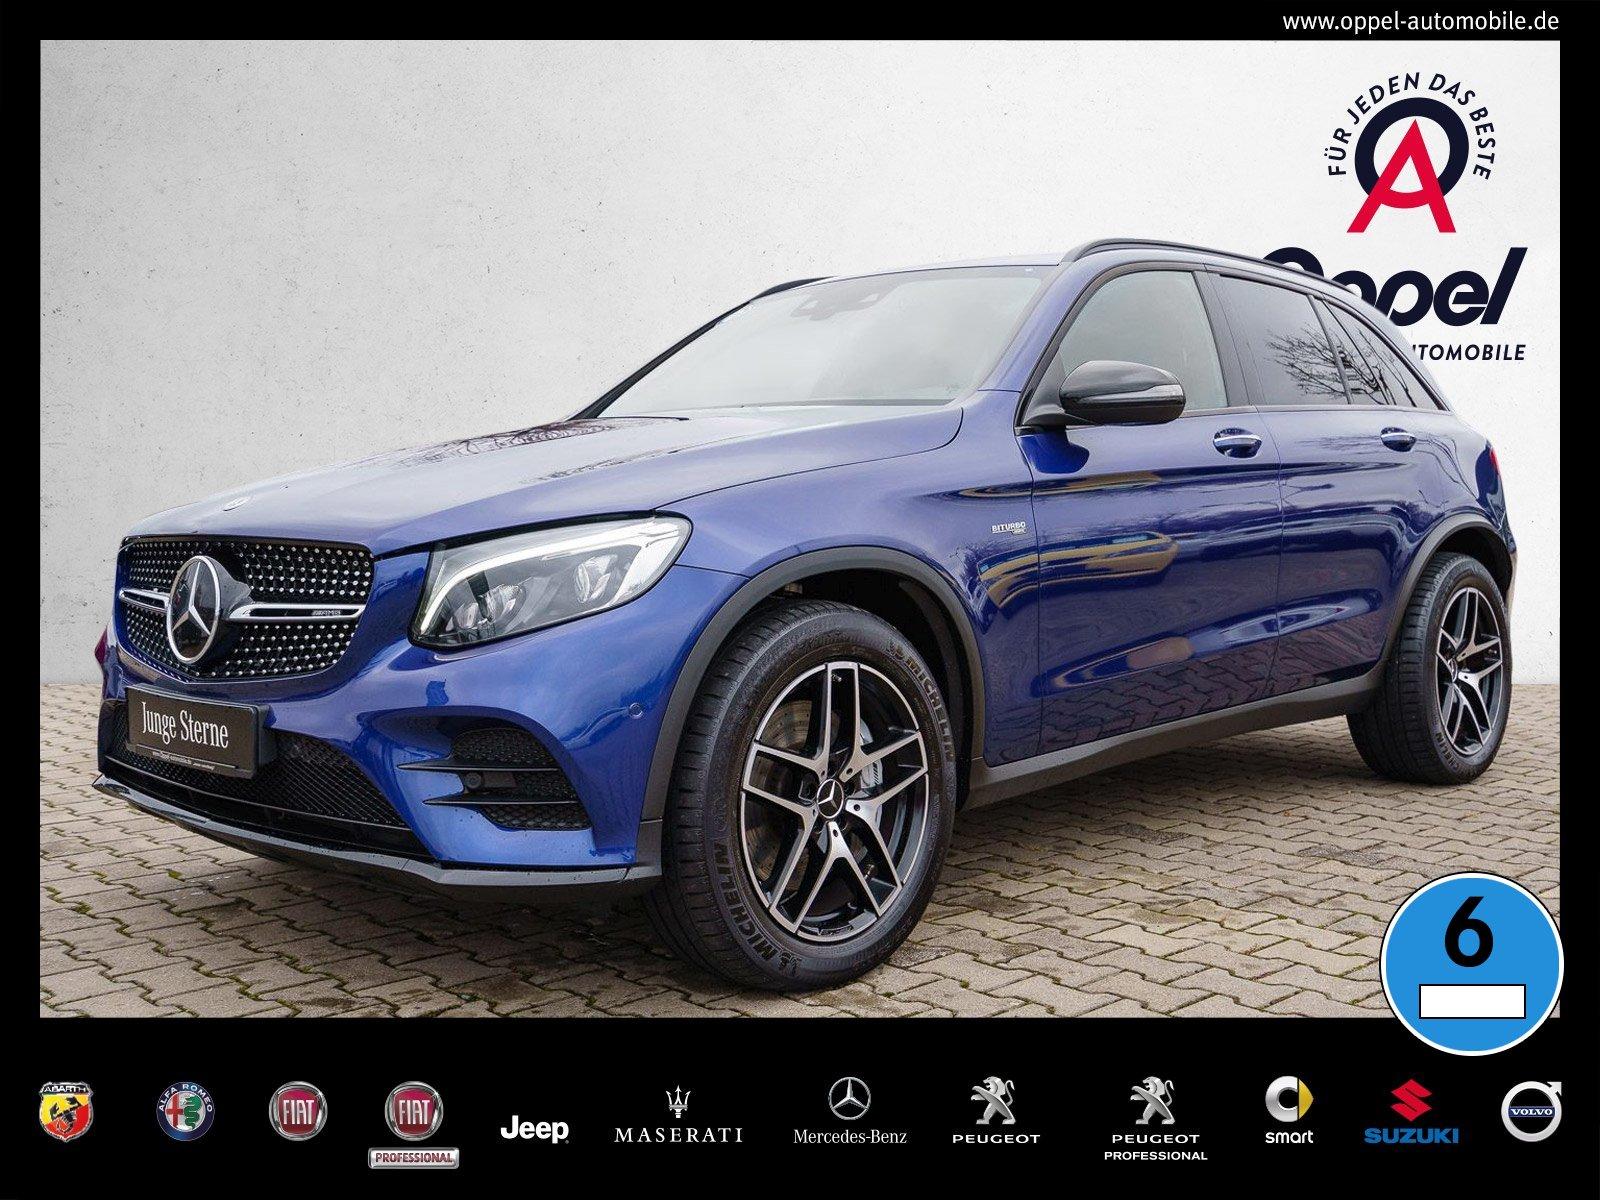 Mercedes-Benz GLC 43 AMG +COMAND+DISTRONIC+KAMERA+AIRMATIC+PTS, Jahr 2018, Benzin